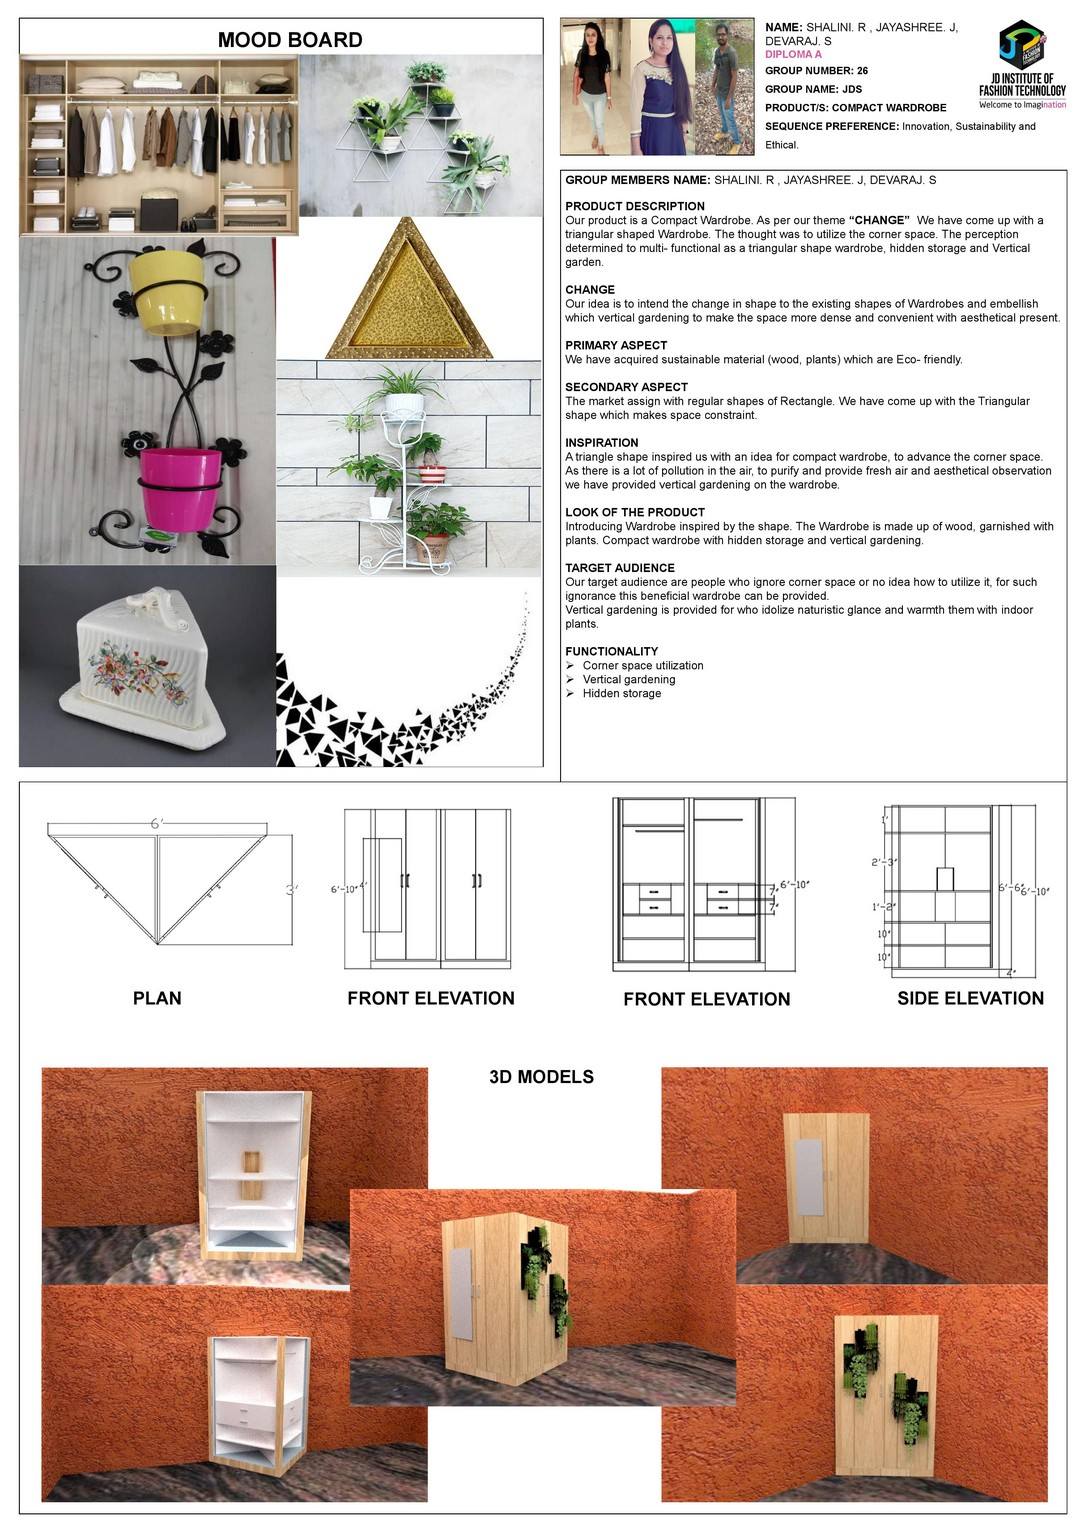 Compact wardrobe – CHANGE – JD ANNUAL DESIGN AWARDS 2018 | Designer: Jayashree J, Devaraj S and Shalini R | Photography : Jerin Nath (@jerin_nath) compact wardrobe Compact wardrobe – Change – JD Annual Design Awards 2018 compact wordrobe1